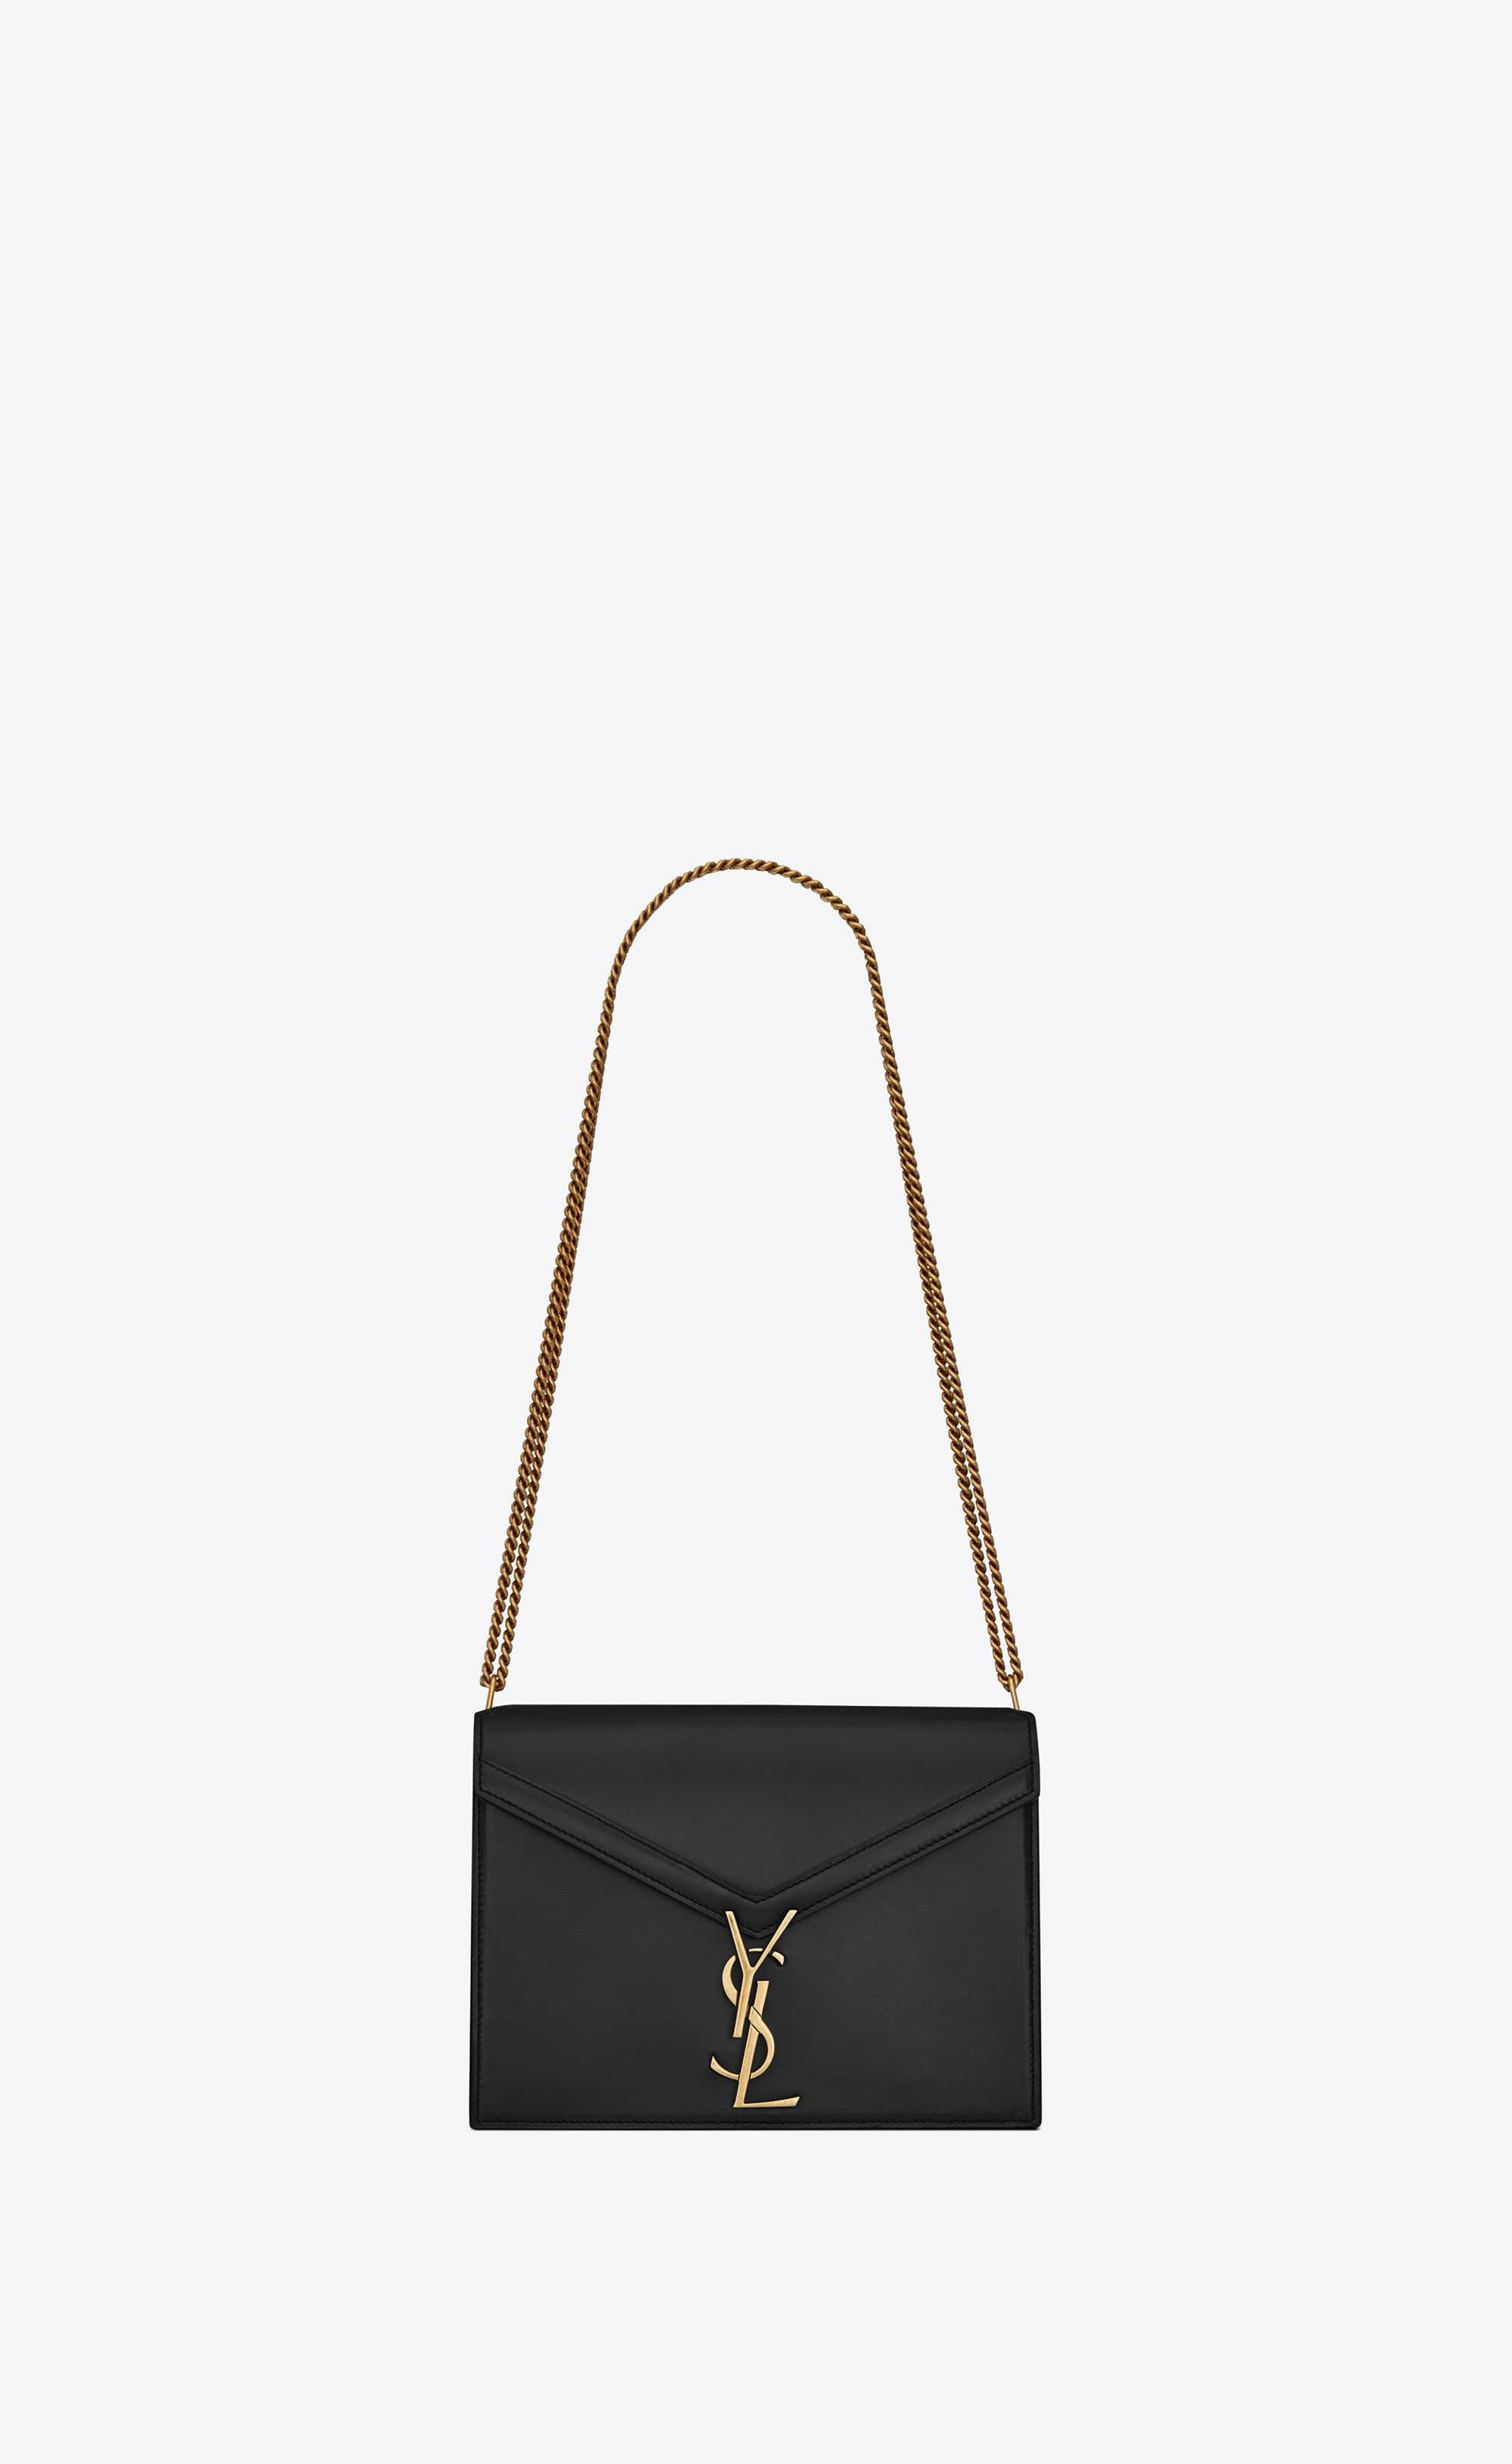 Saint Laurent Cassandra Chain Bag In Black Leather Ysl Com Bags Saint Laurent Yves Saint Laurent Bags